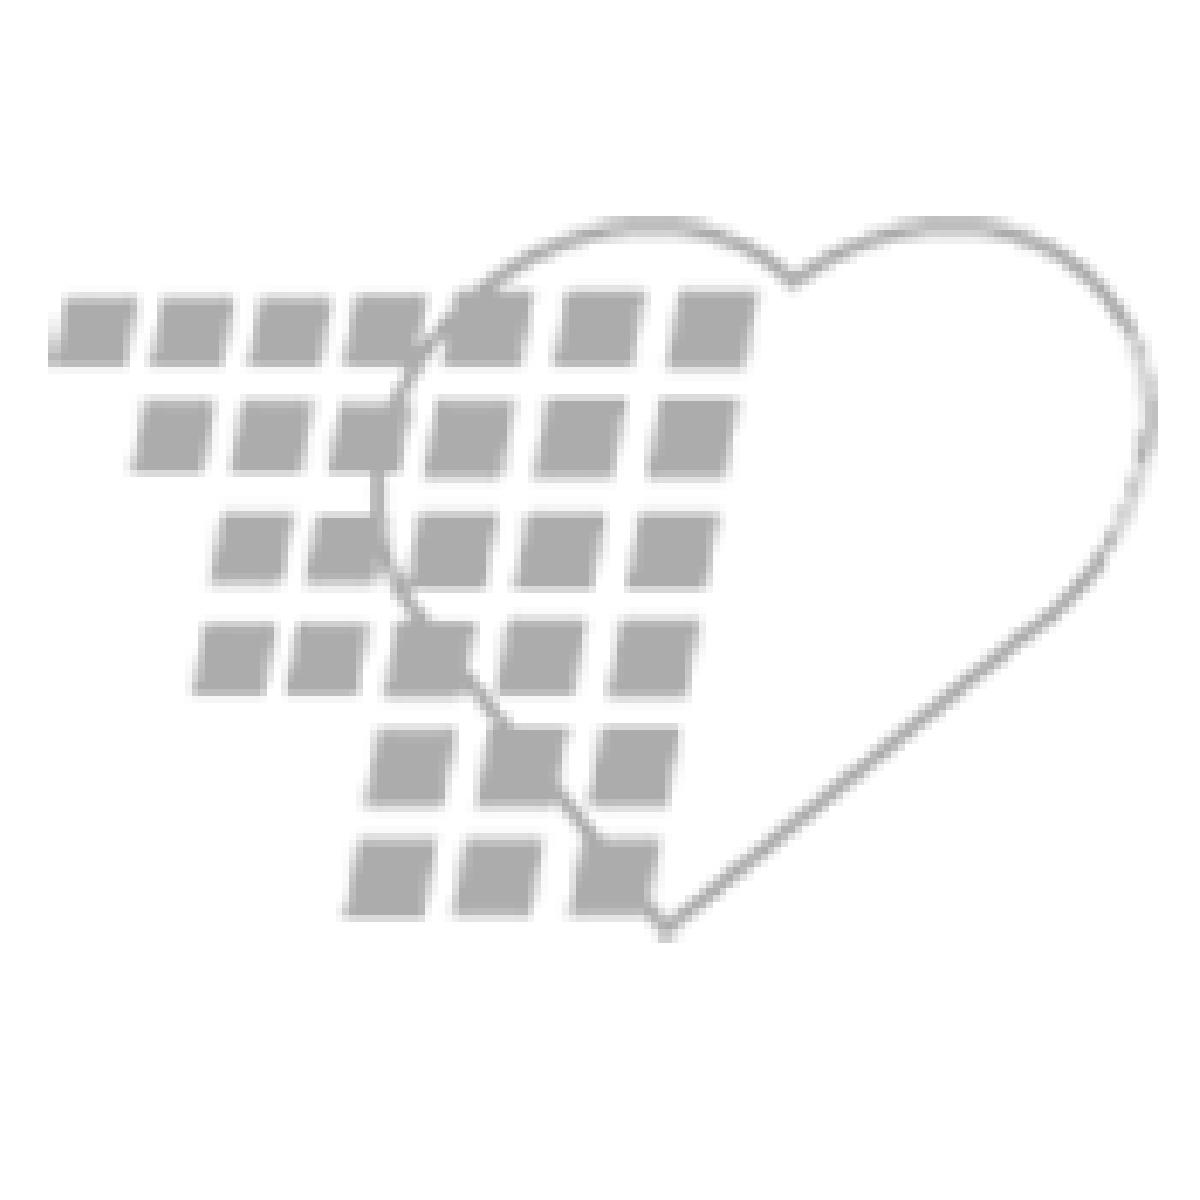 06-93-0710 Demo Dose® Warfarn Sodim (Coumadn) 5mg Tablet UD - 100 Pills/Box